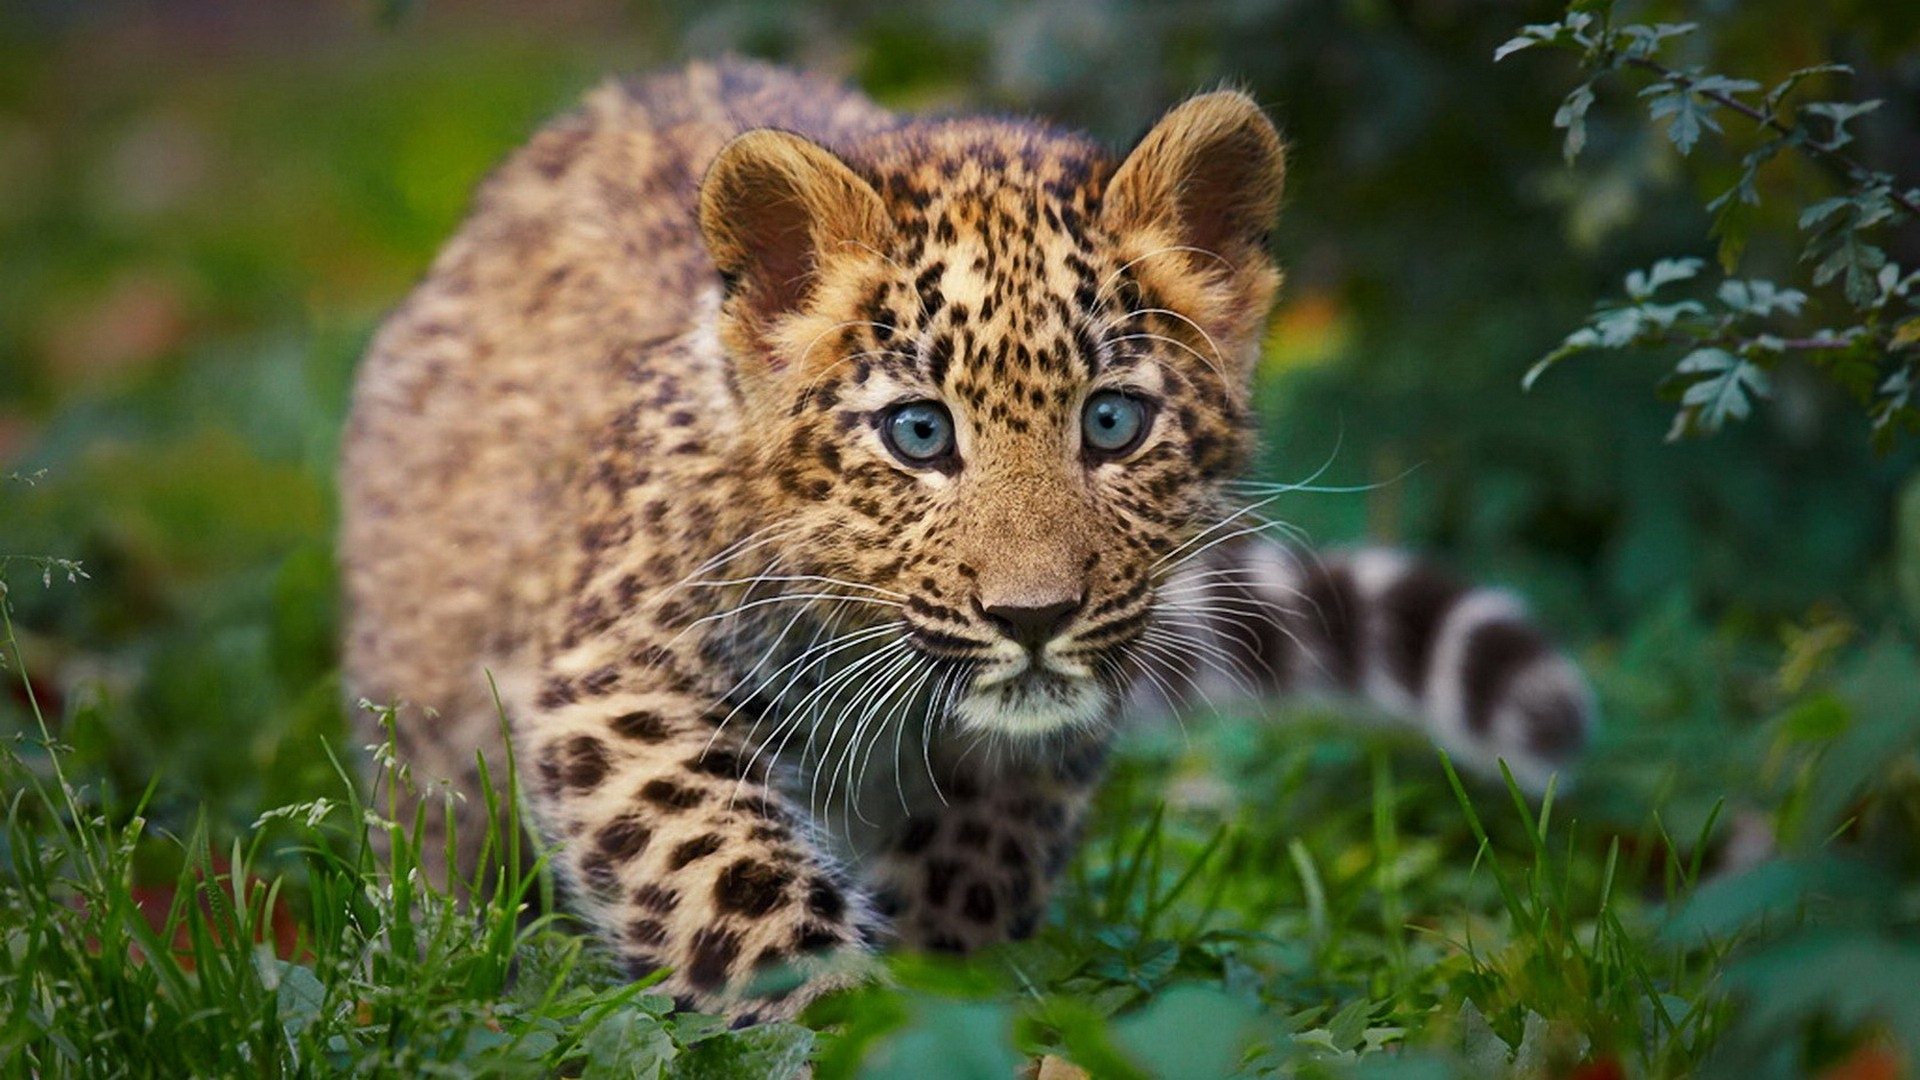 Baby Cheetah Wallpaper Iphone - Wickedsa com